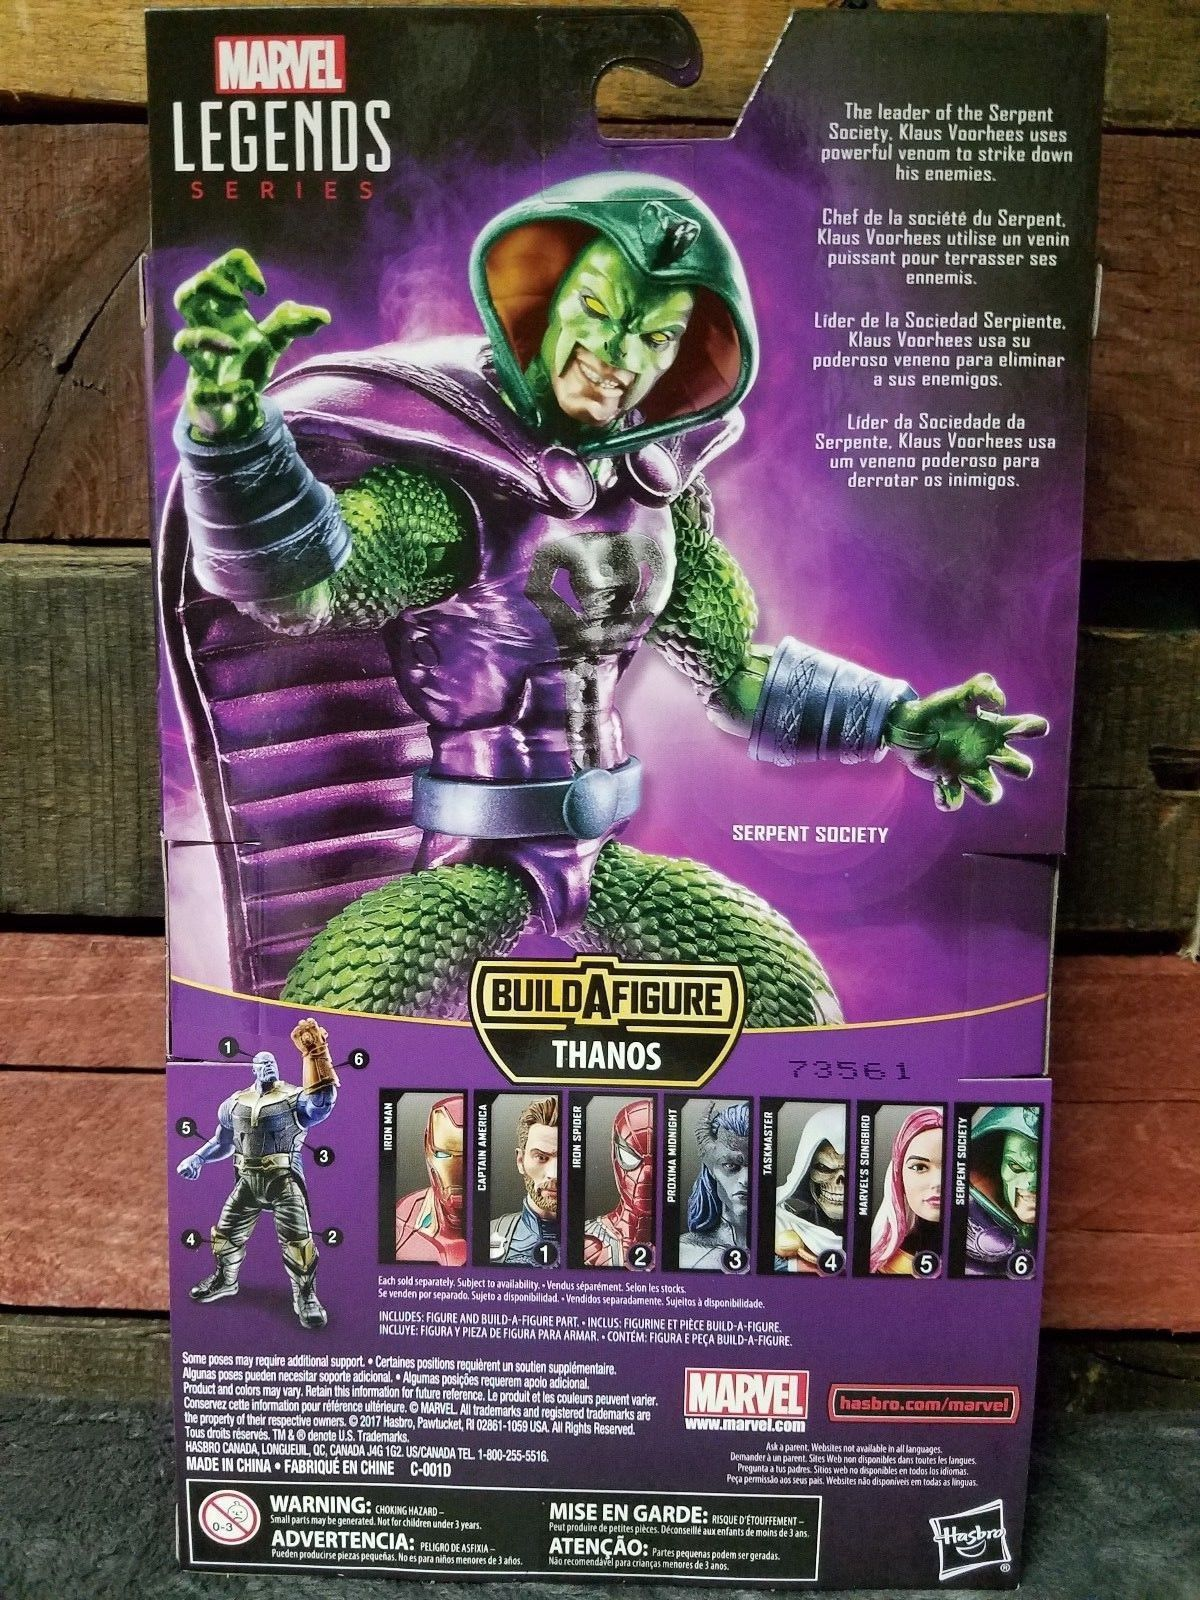 Marvel Legends - Serpent Society - (BAF - Thanos) - Action Figure